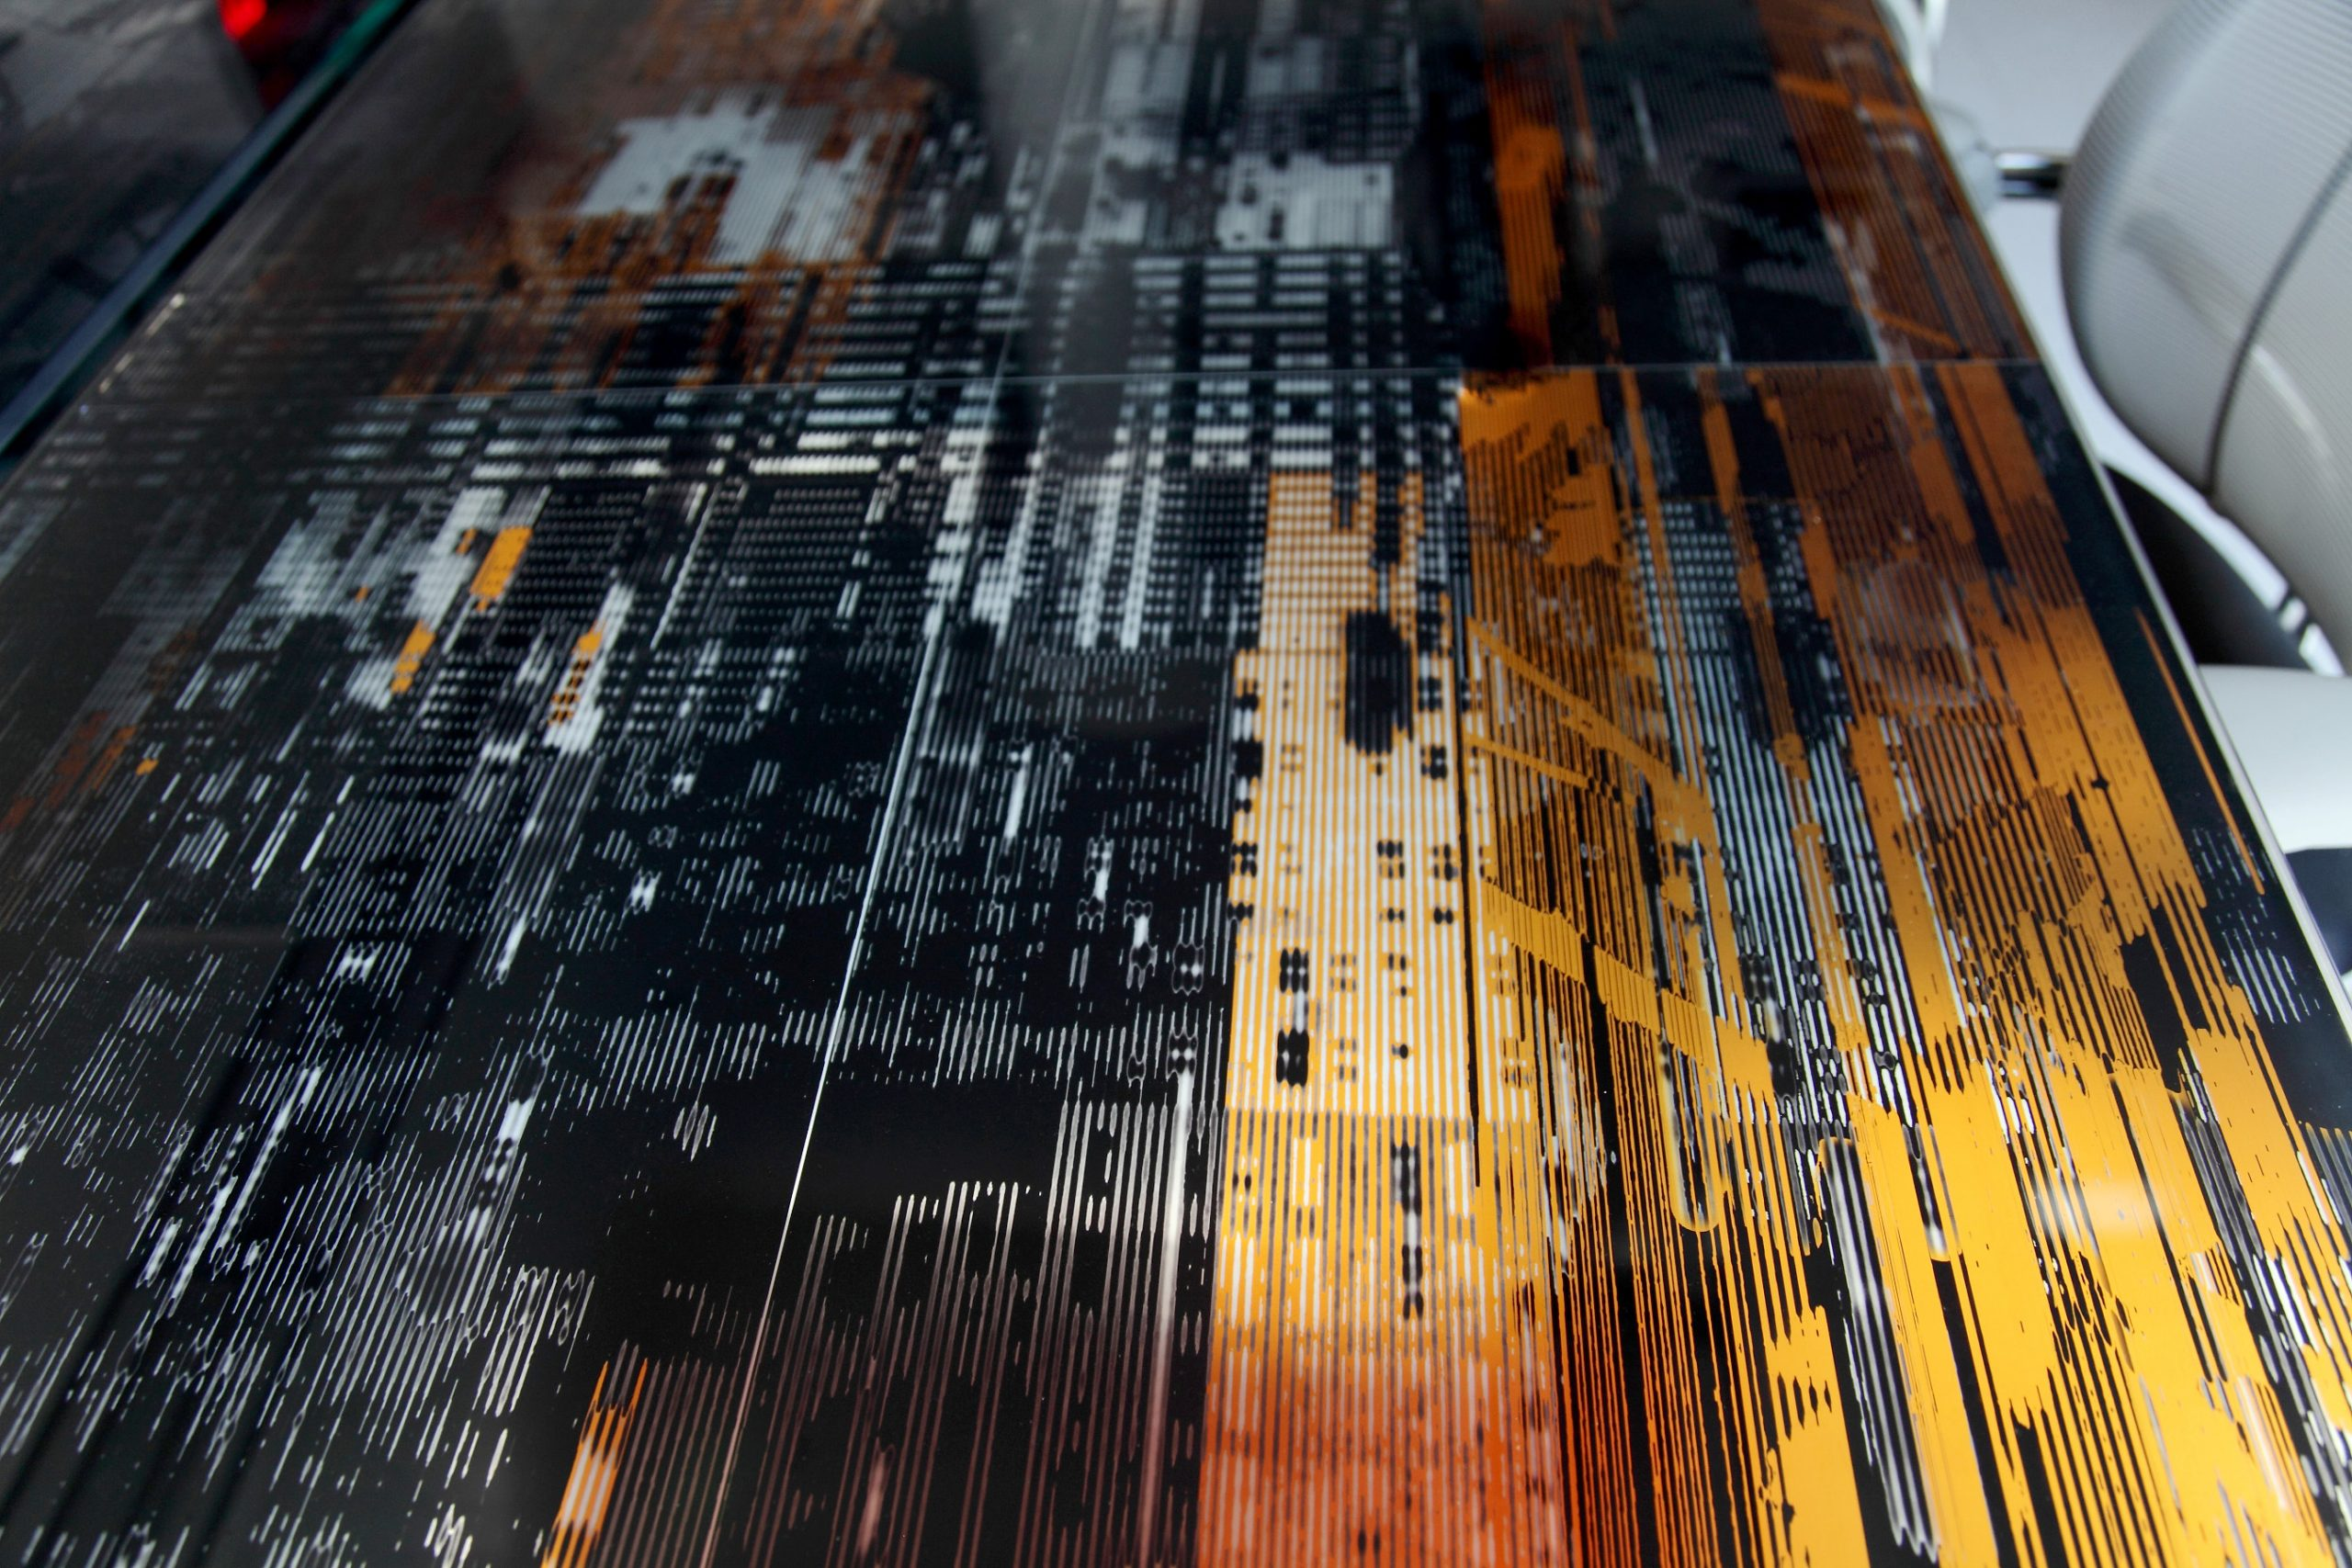 Reconfiguring Memory